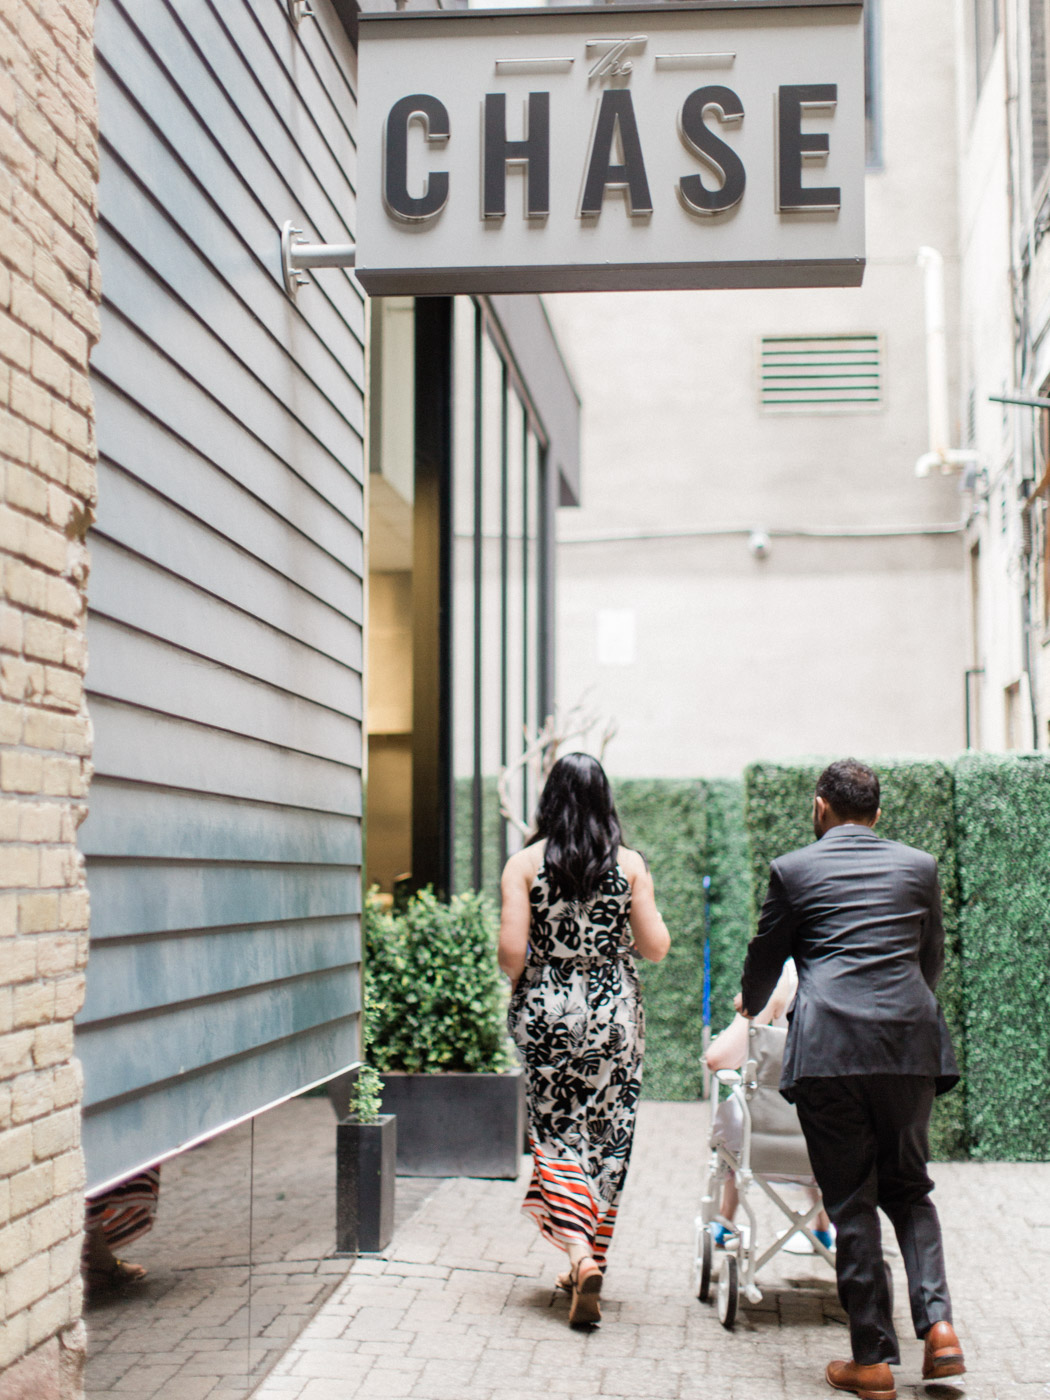 Toronto-wedding-photographer-intimate-restaurant-elopement-chase-oyster-downtown21.jpg